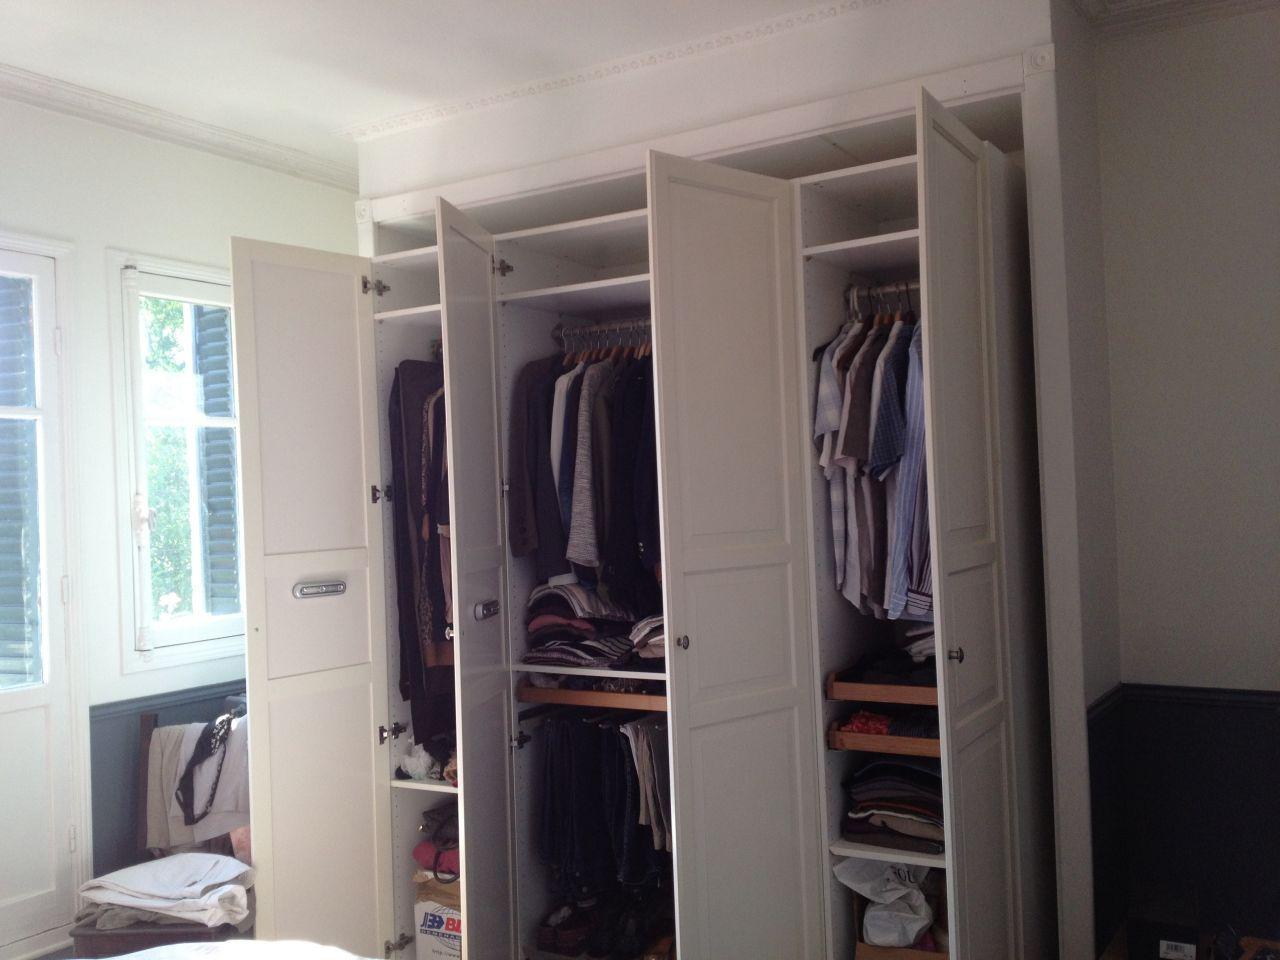 construction et am nagement du dressing cr pi c 39 est fini val d oise. Black Bedroom Furniture Sets. Home Design Ideas